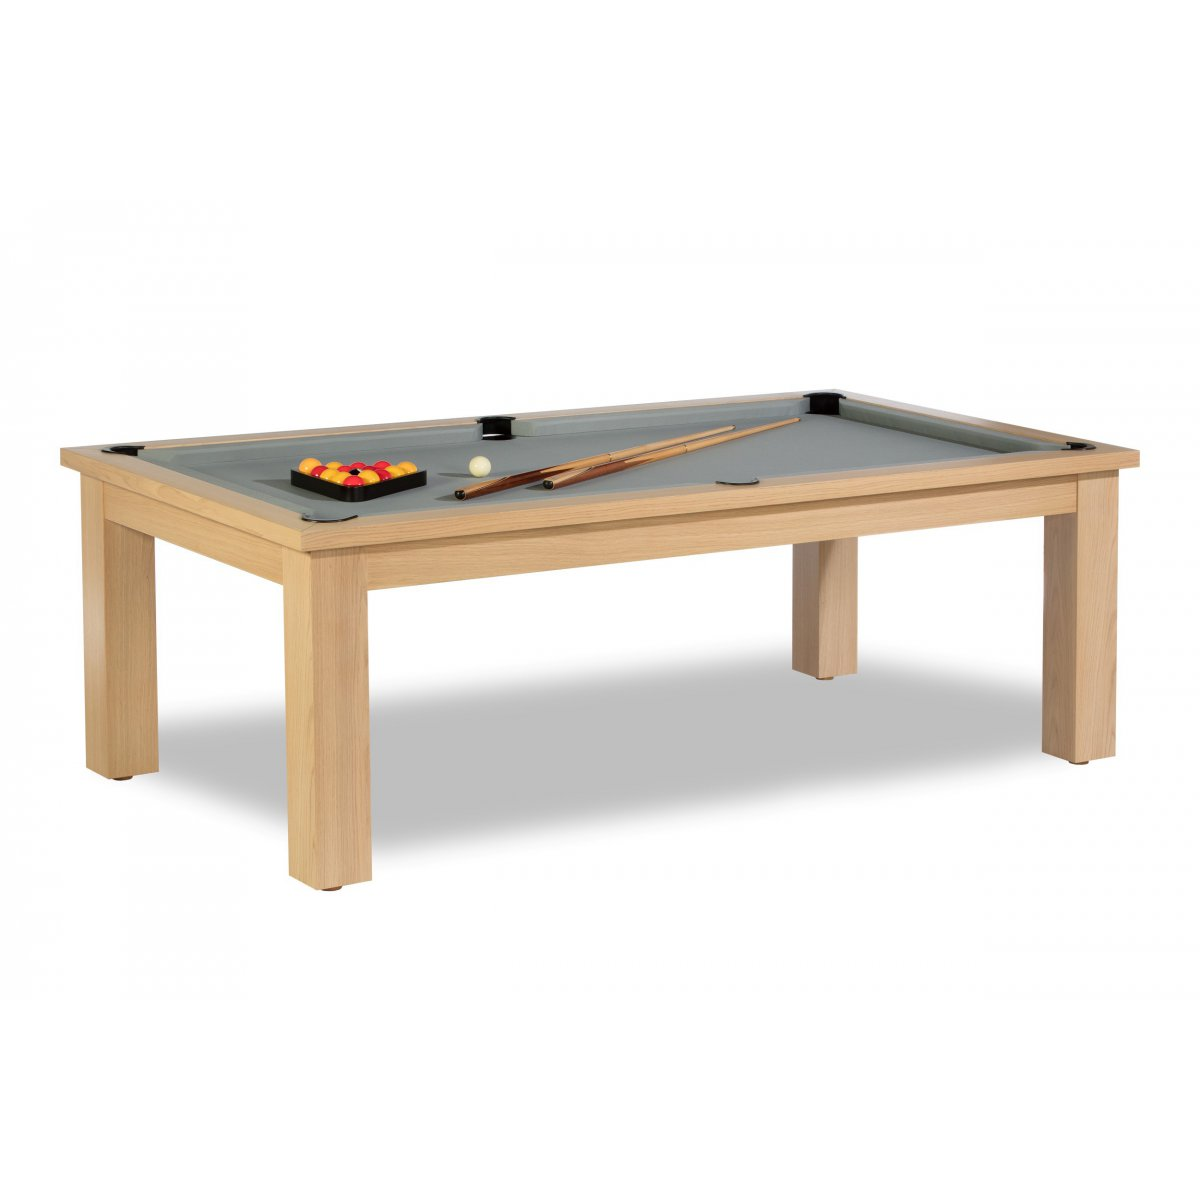 billard convertible la table de billard design vancouver. Black Bedroom Furniture Sets. Home Design Ideas